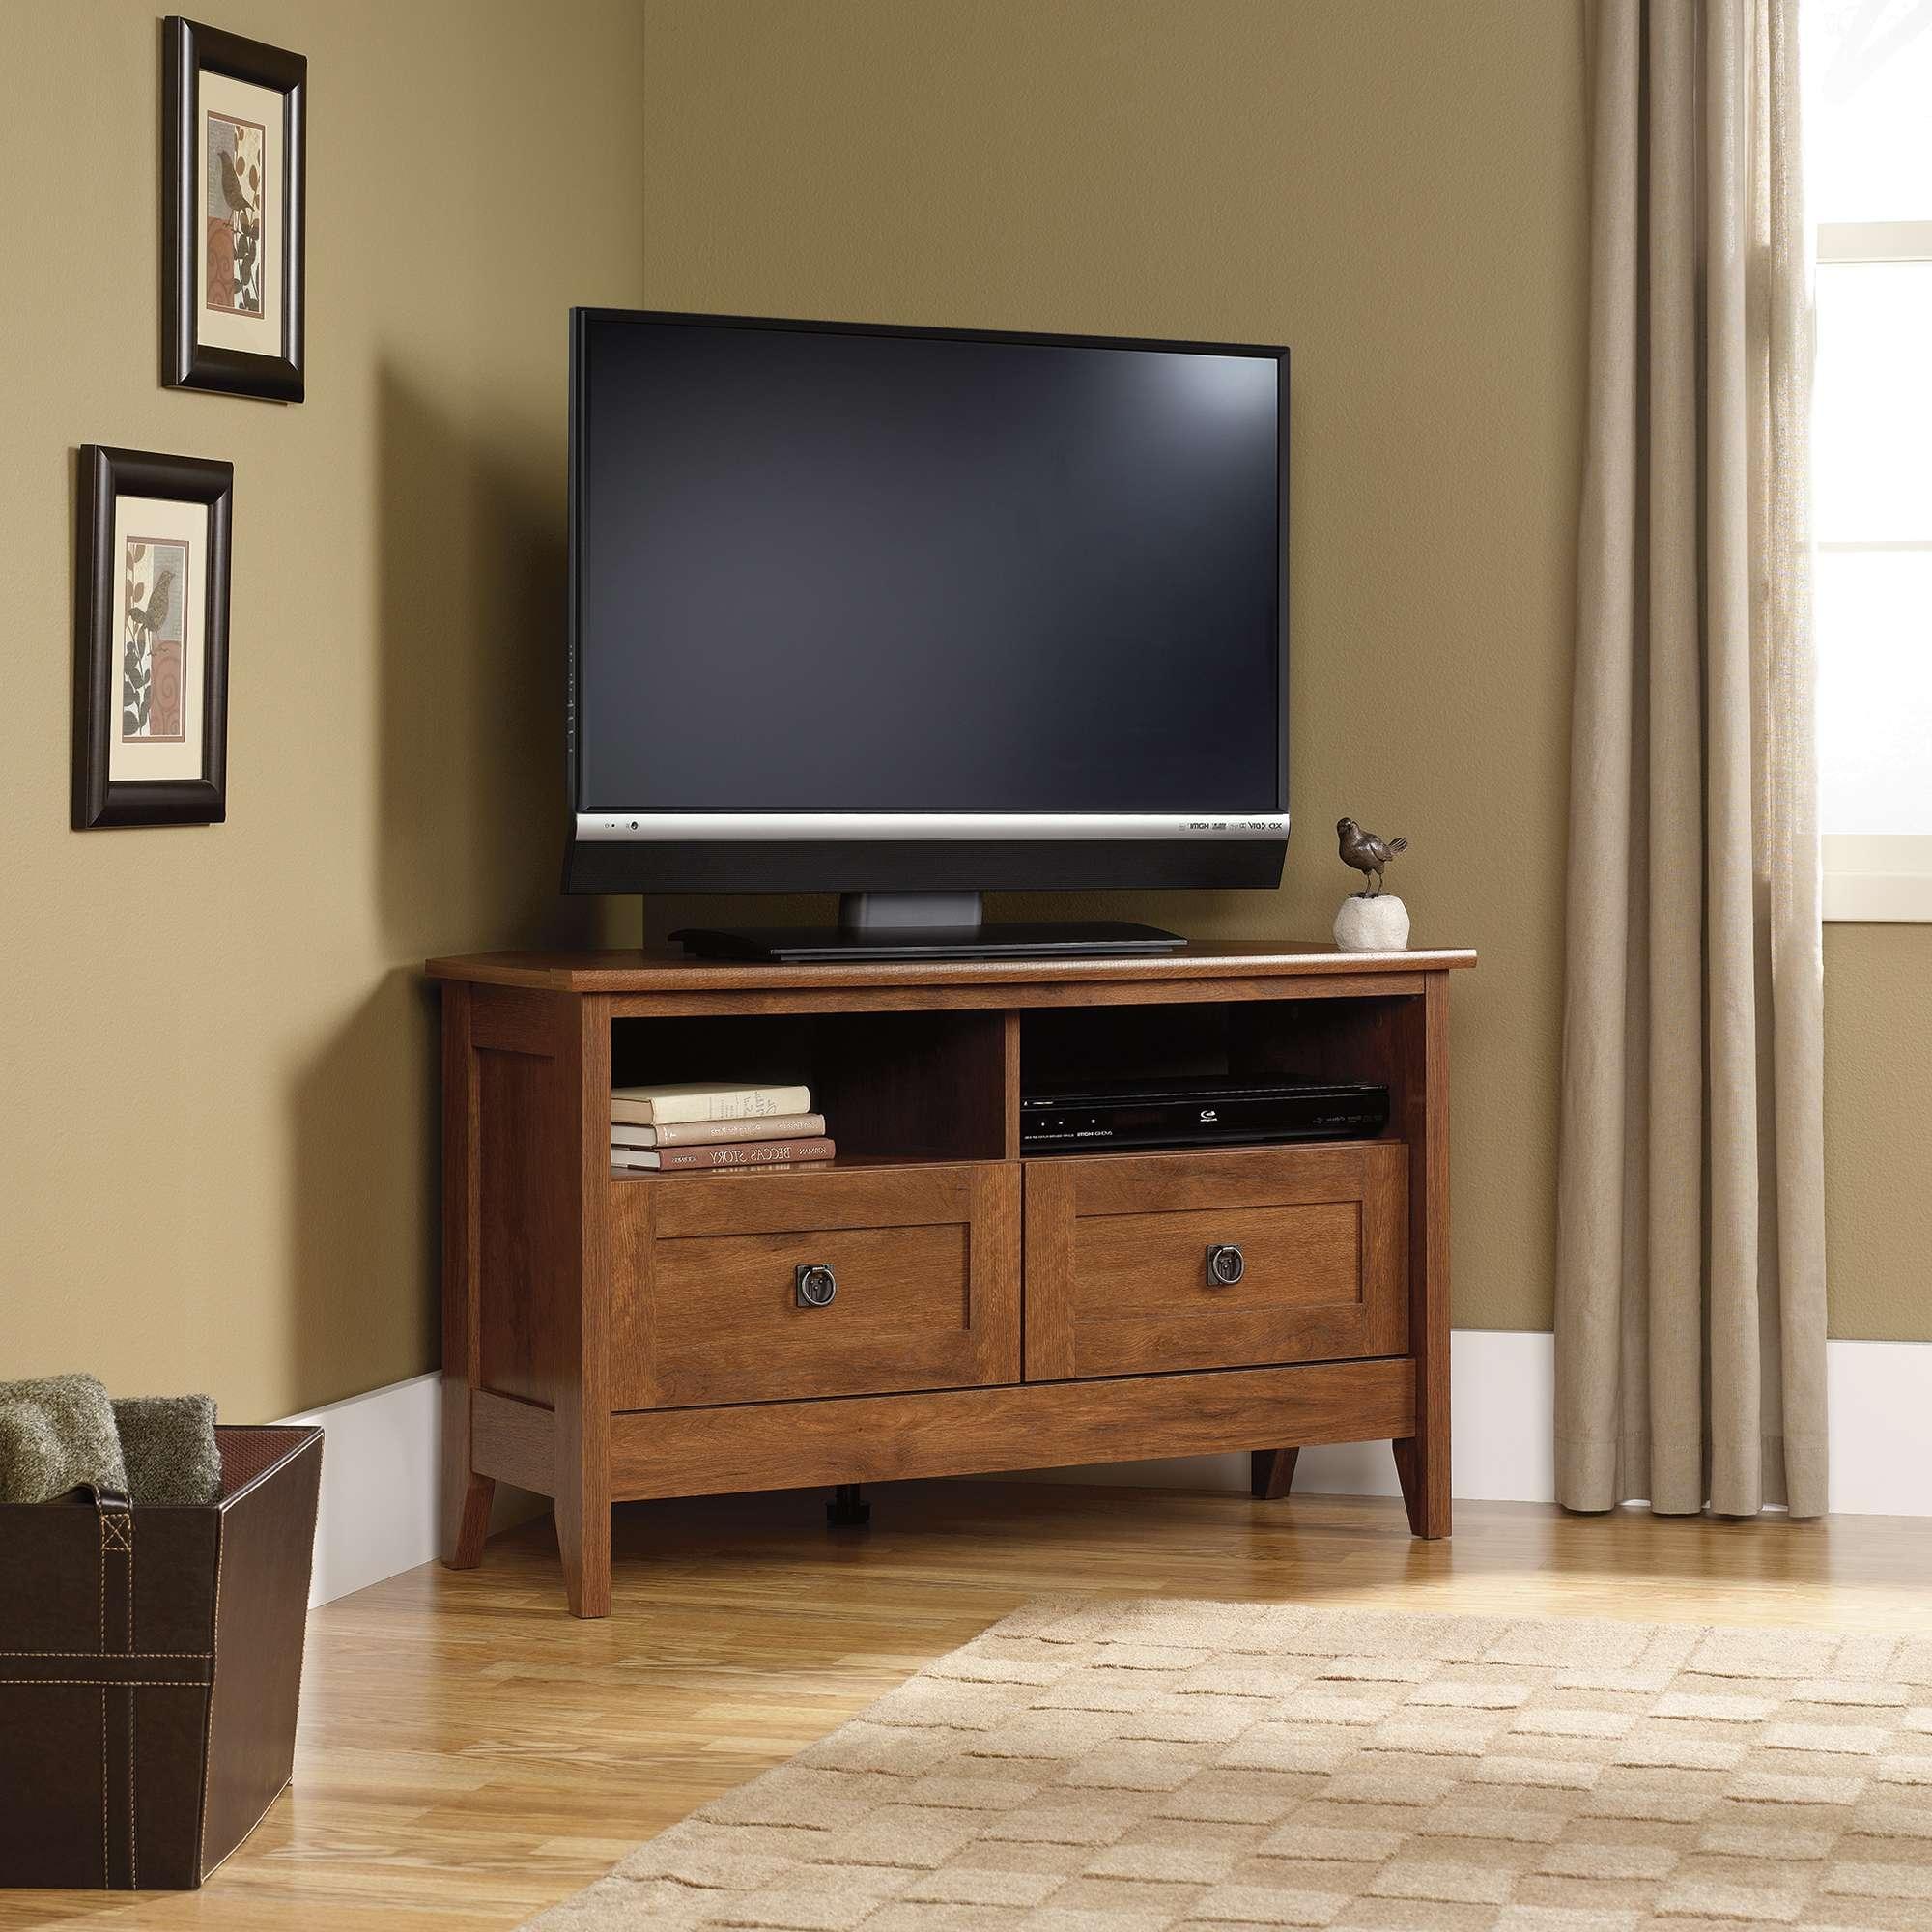 Sauder Select | Corner Tv Stand | 410627 | Sauder Throughout Dark Brown Corner Tv Stands (View 5 of 20)